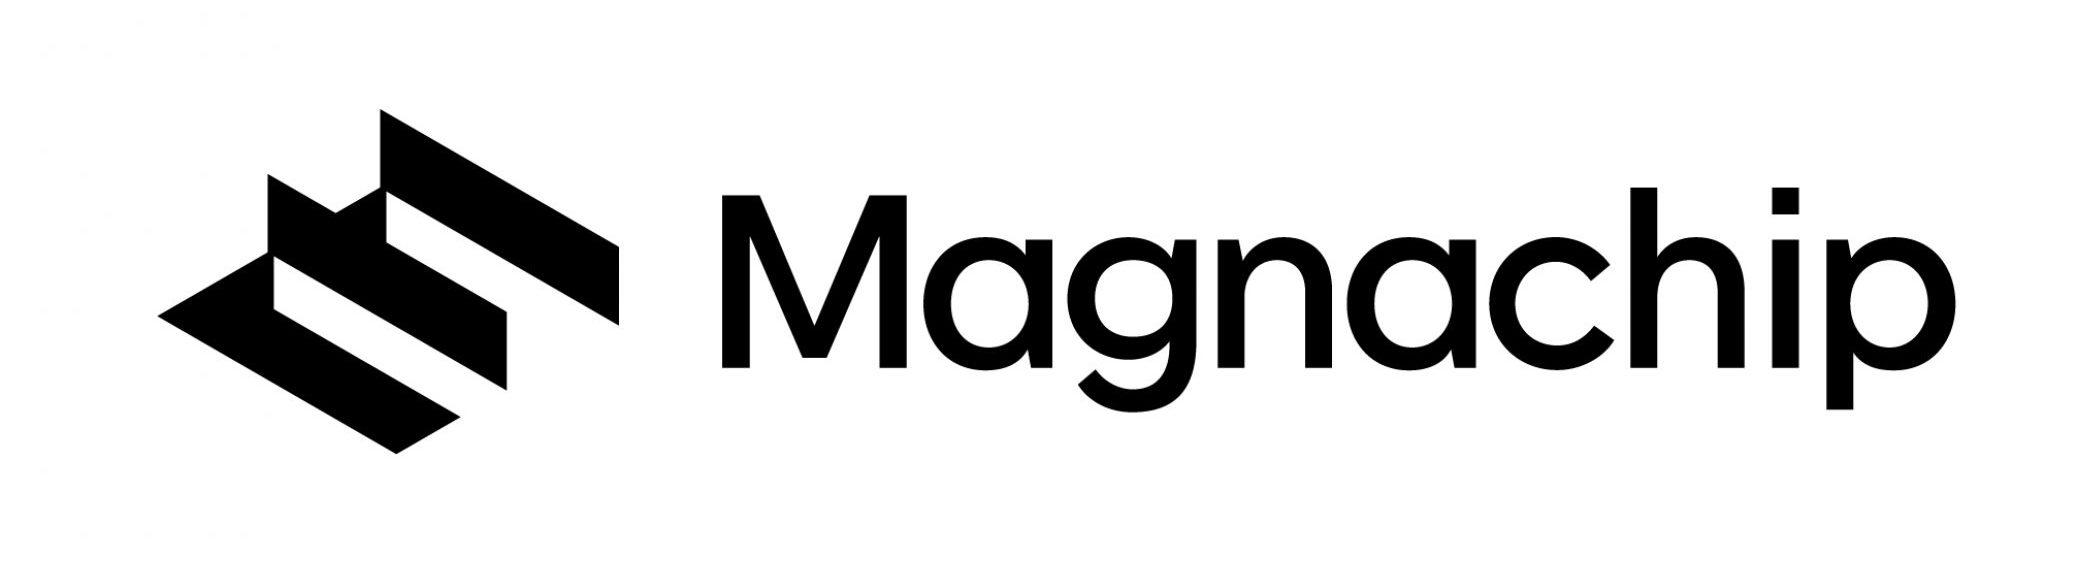 MagnaChip